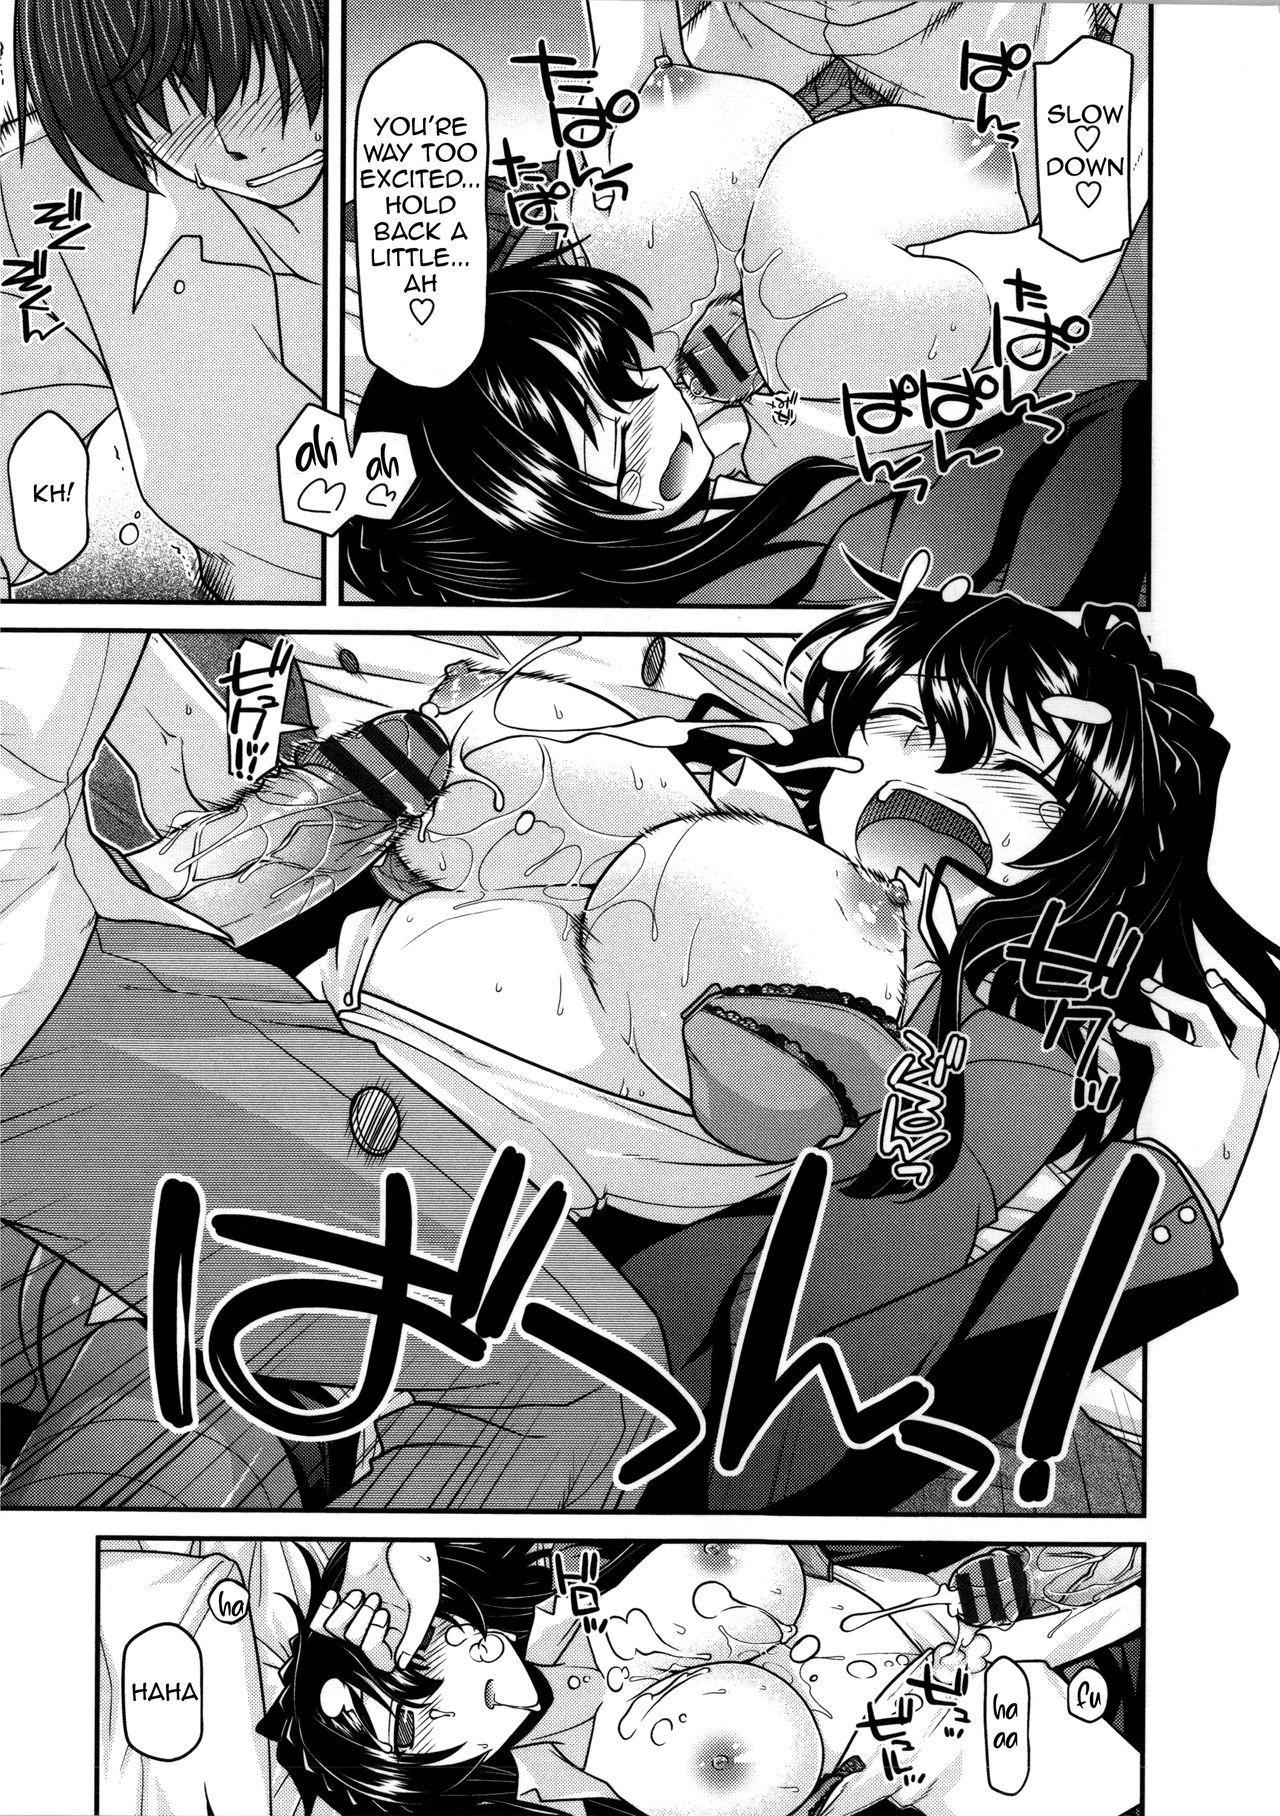 [Miyashiro Sousuke] Yamato Nadeshiko Chichi Henge - Yamato Nadeshiko Breast Changes Ch. 0-1, 4, 7-9 [English] 57